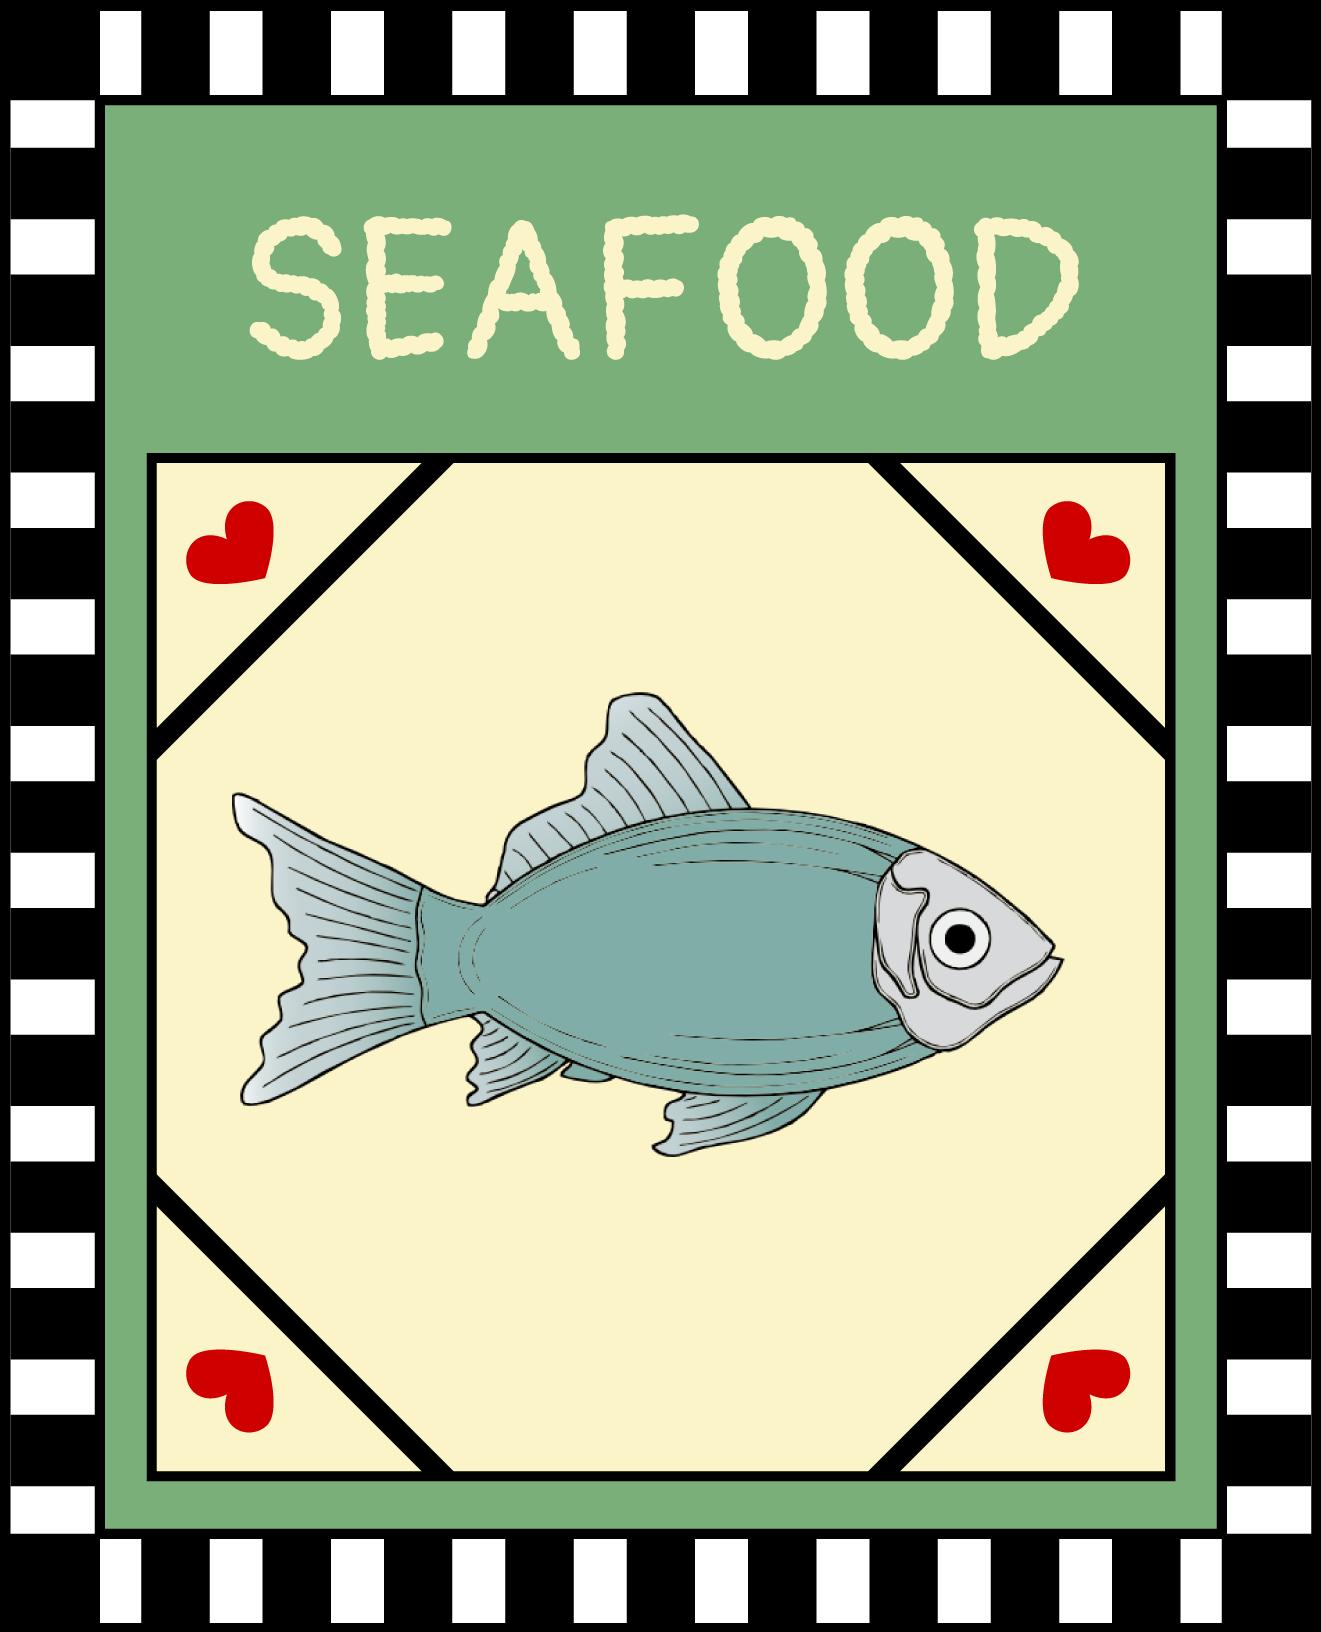 Fish / Seafood